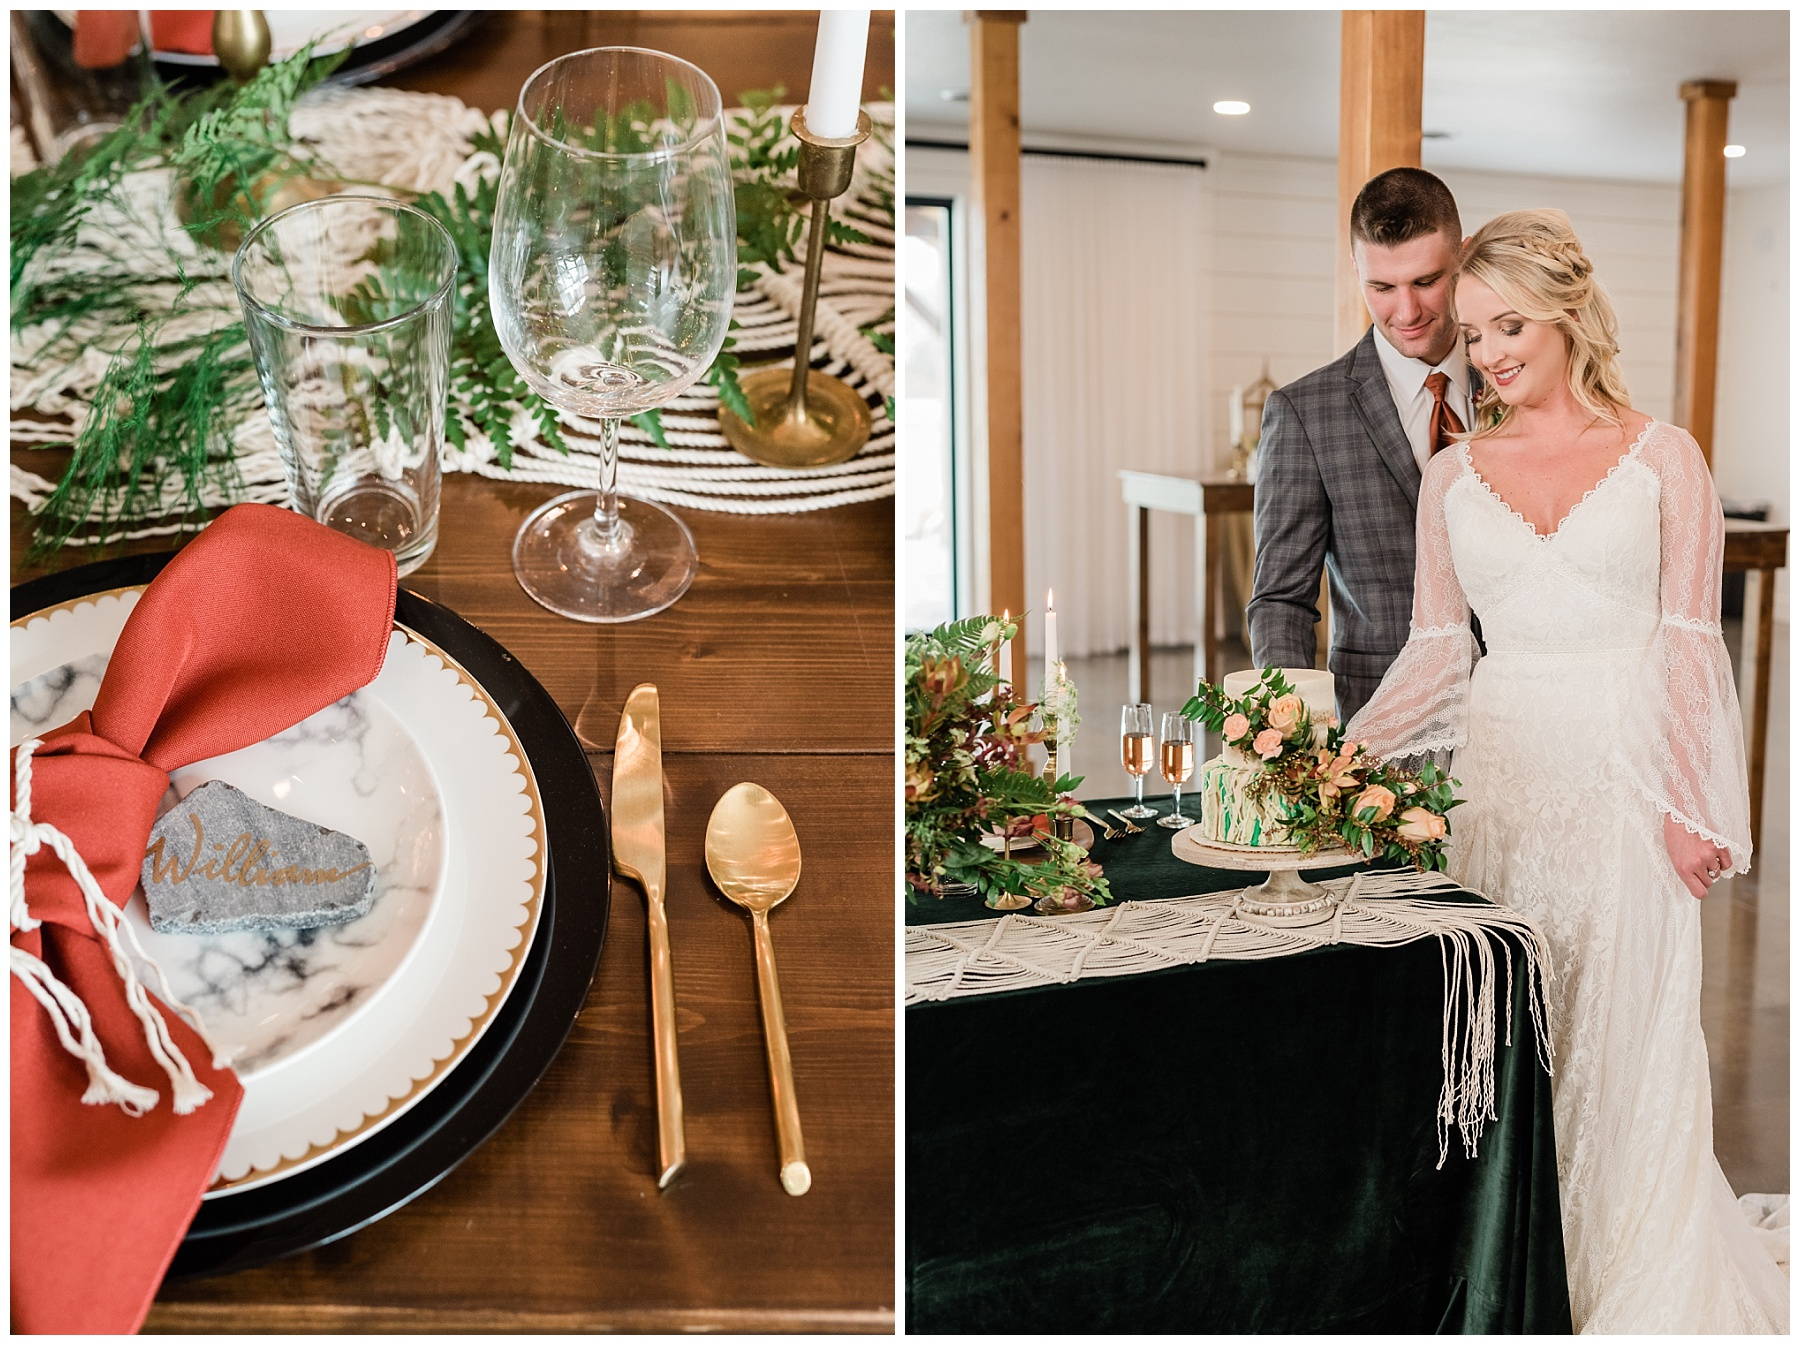 Eclectic Scandinavian Winter Wedding in All White Venue Emerson Fields by Kelsi Kliethermes Photography Best Missouri and Maui Wedding Photographer_0064.jpg